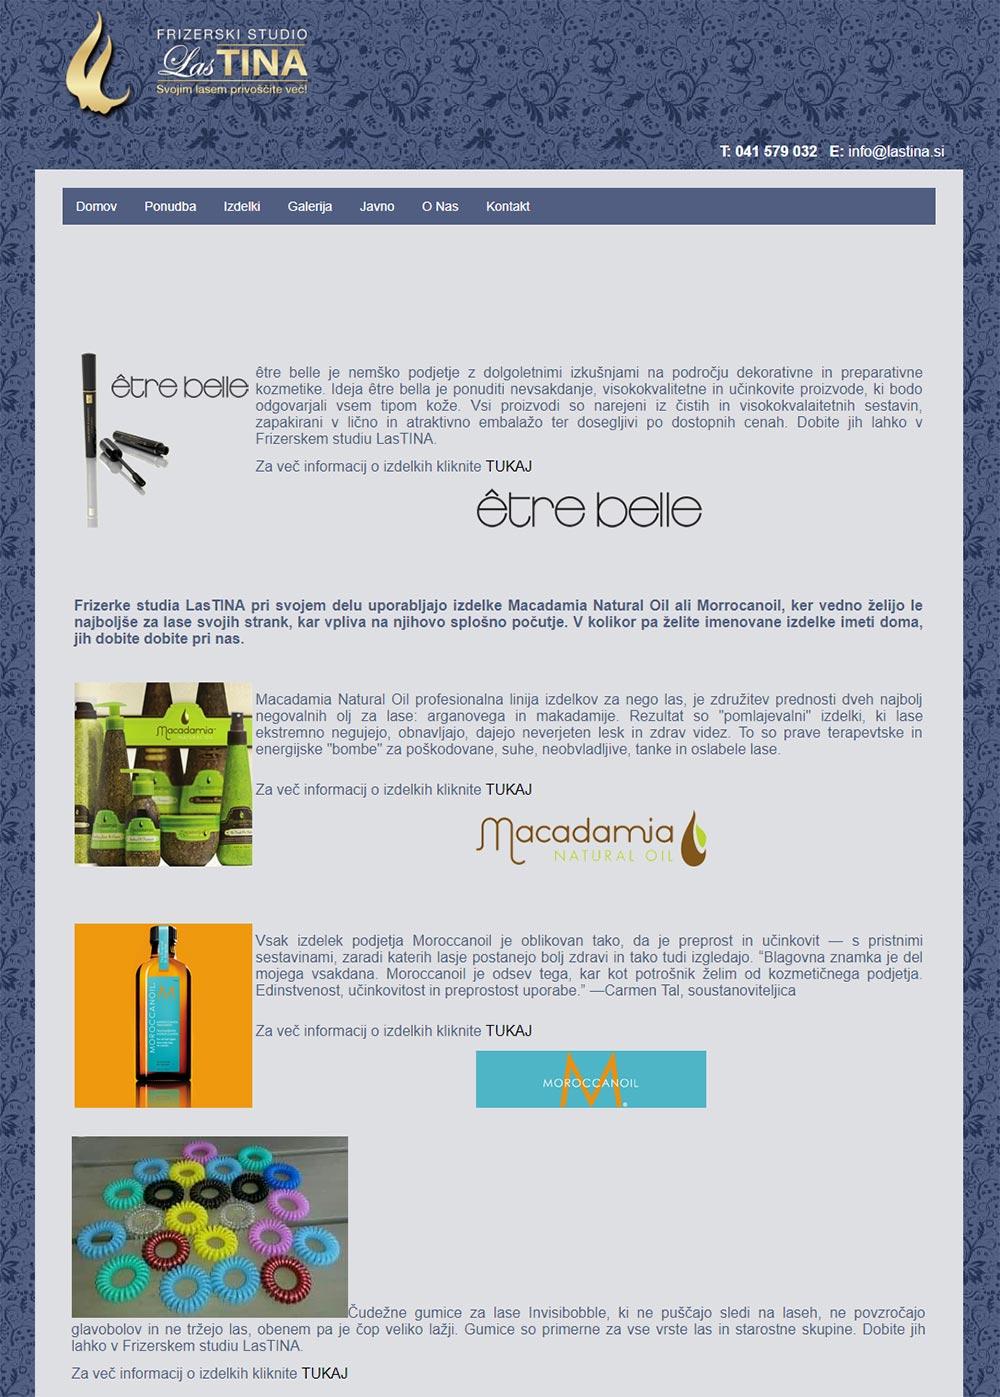 vizualno-oblikovanje-LasTina (4)